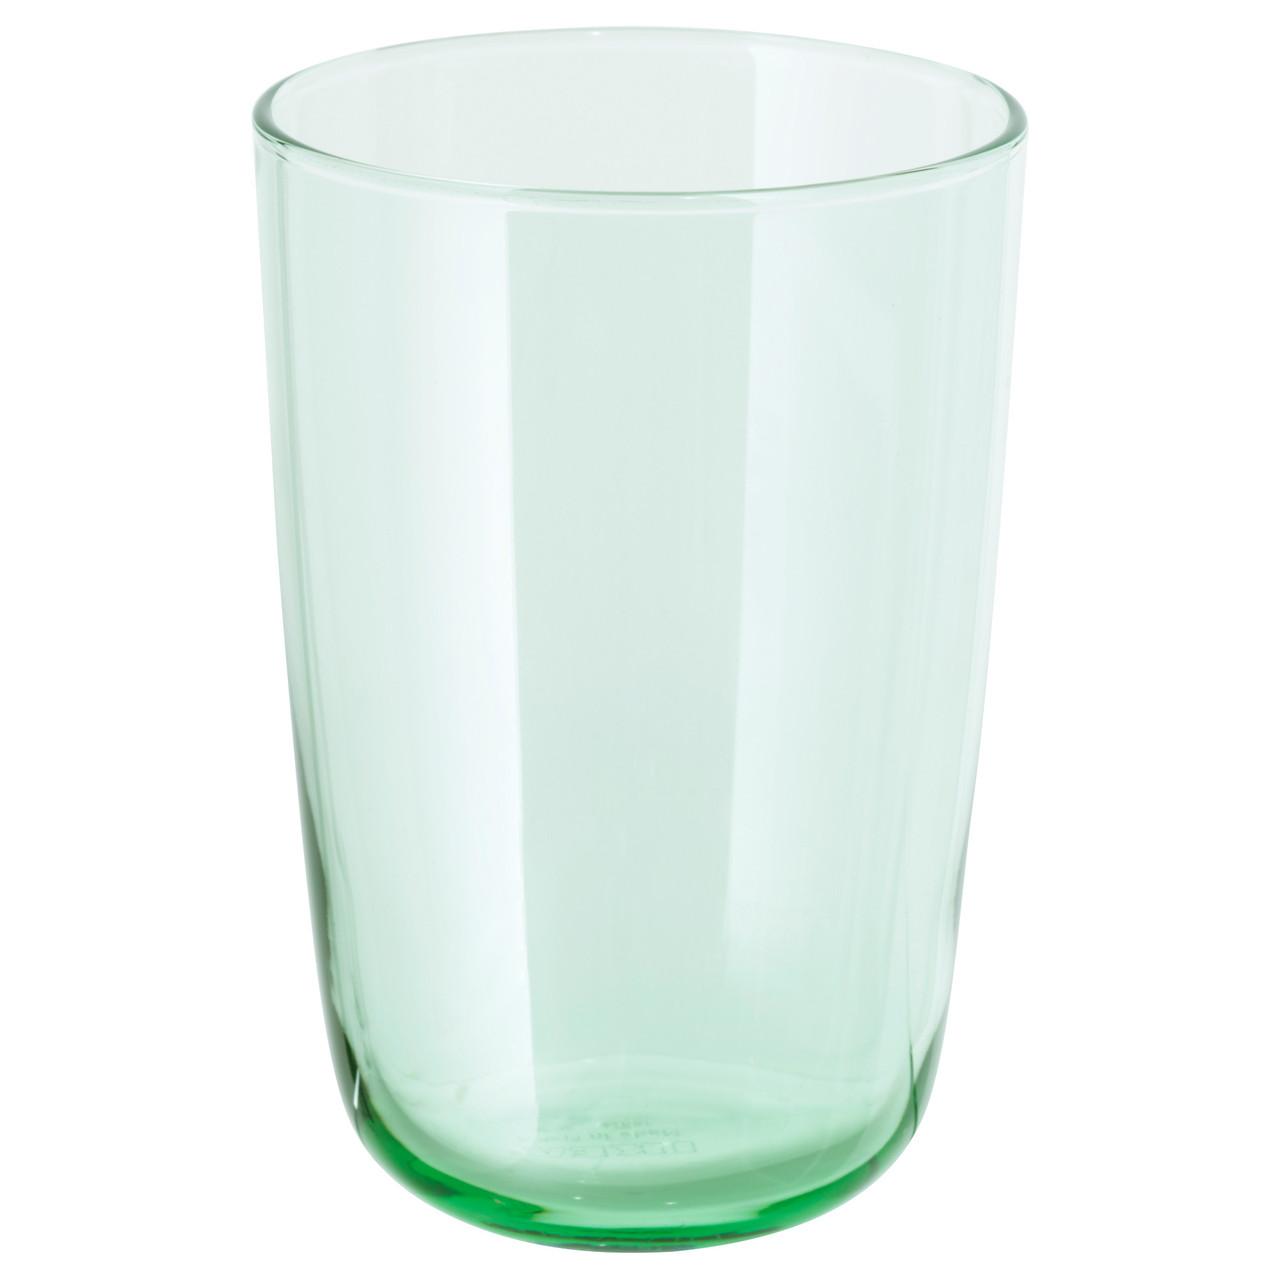 "ИКЕА ""ИНТАГАНДЕ"" Стакан, светло-зеленый. 460мл."